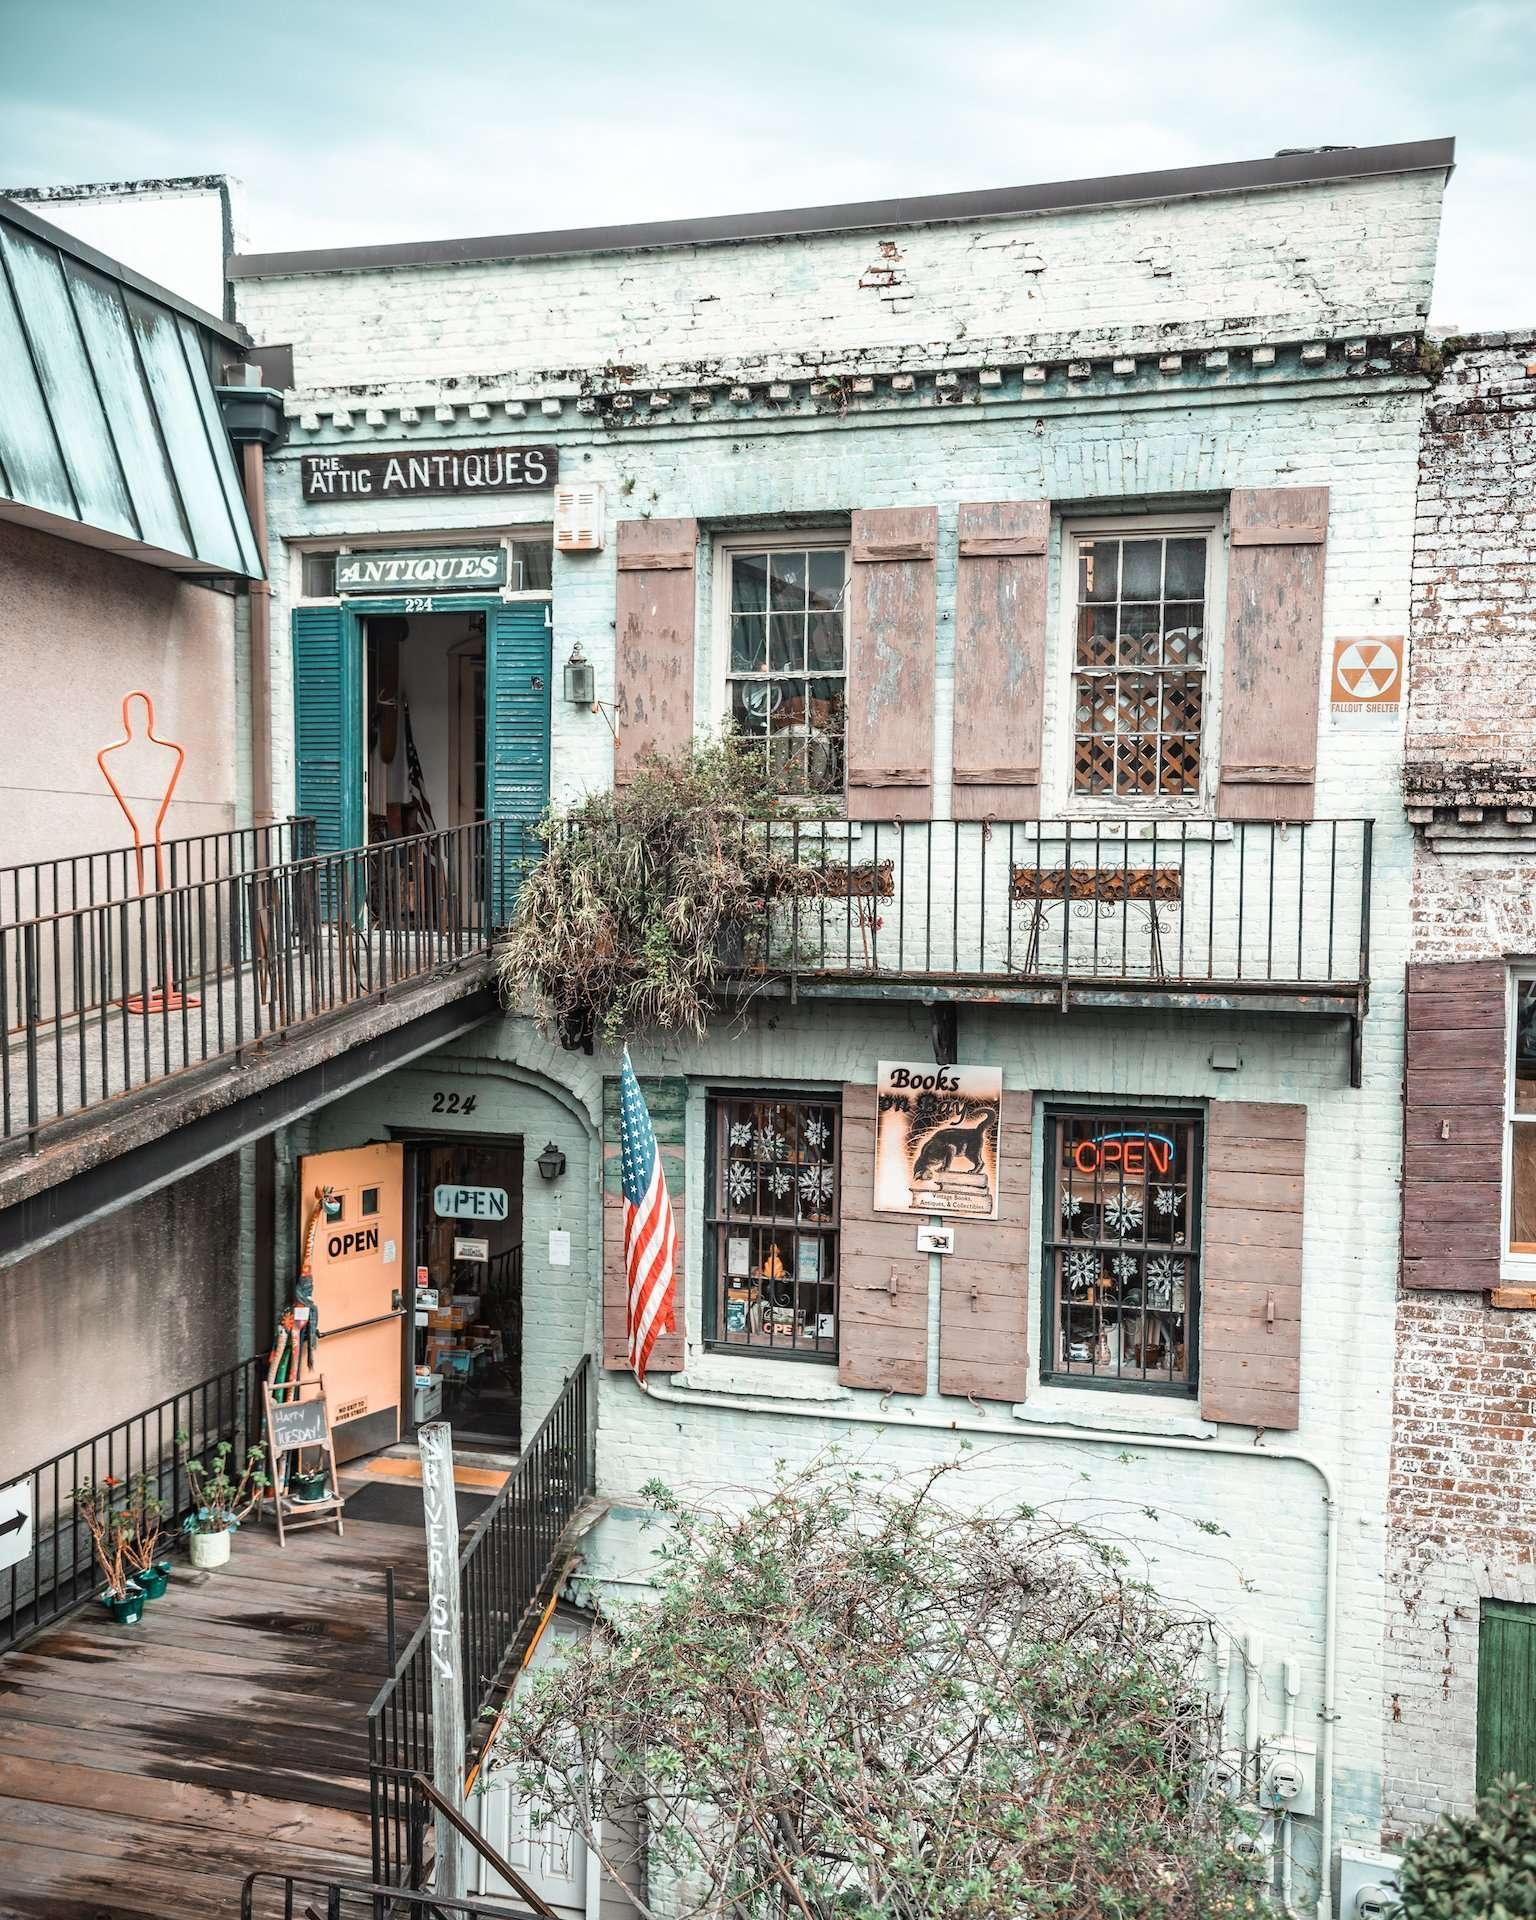 Attic Antiques, Savannah